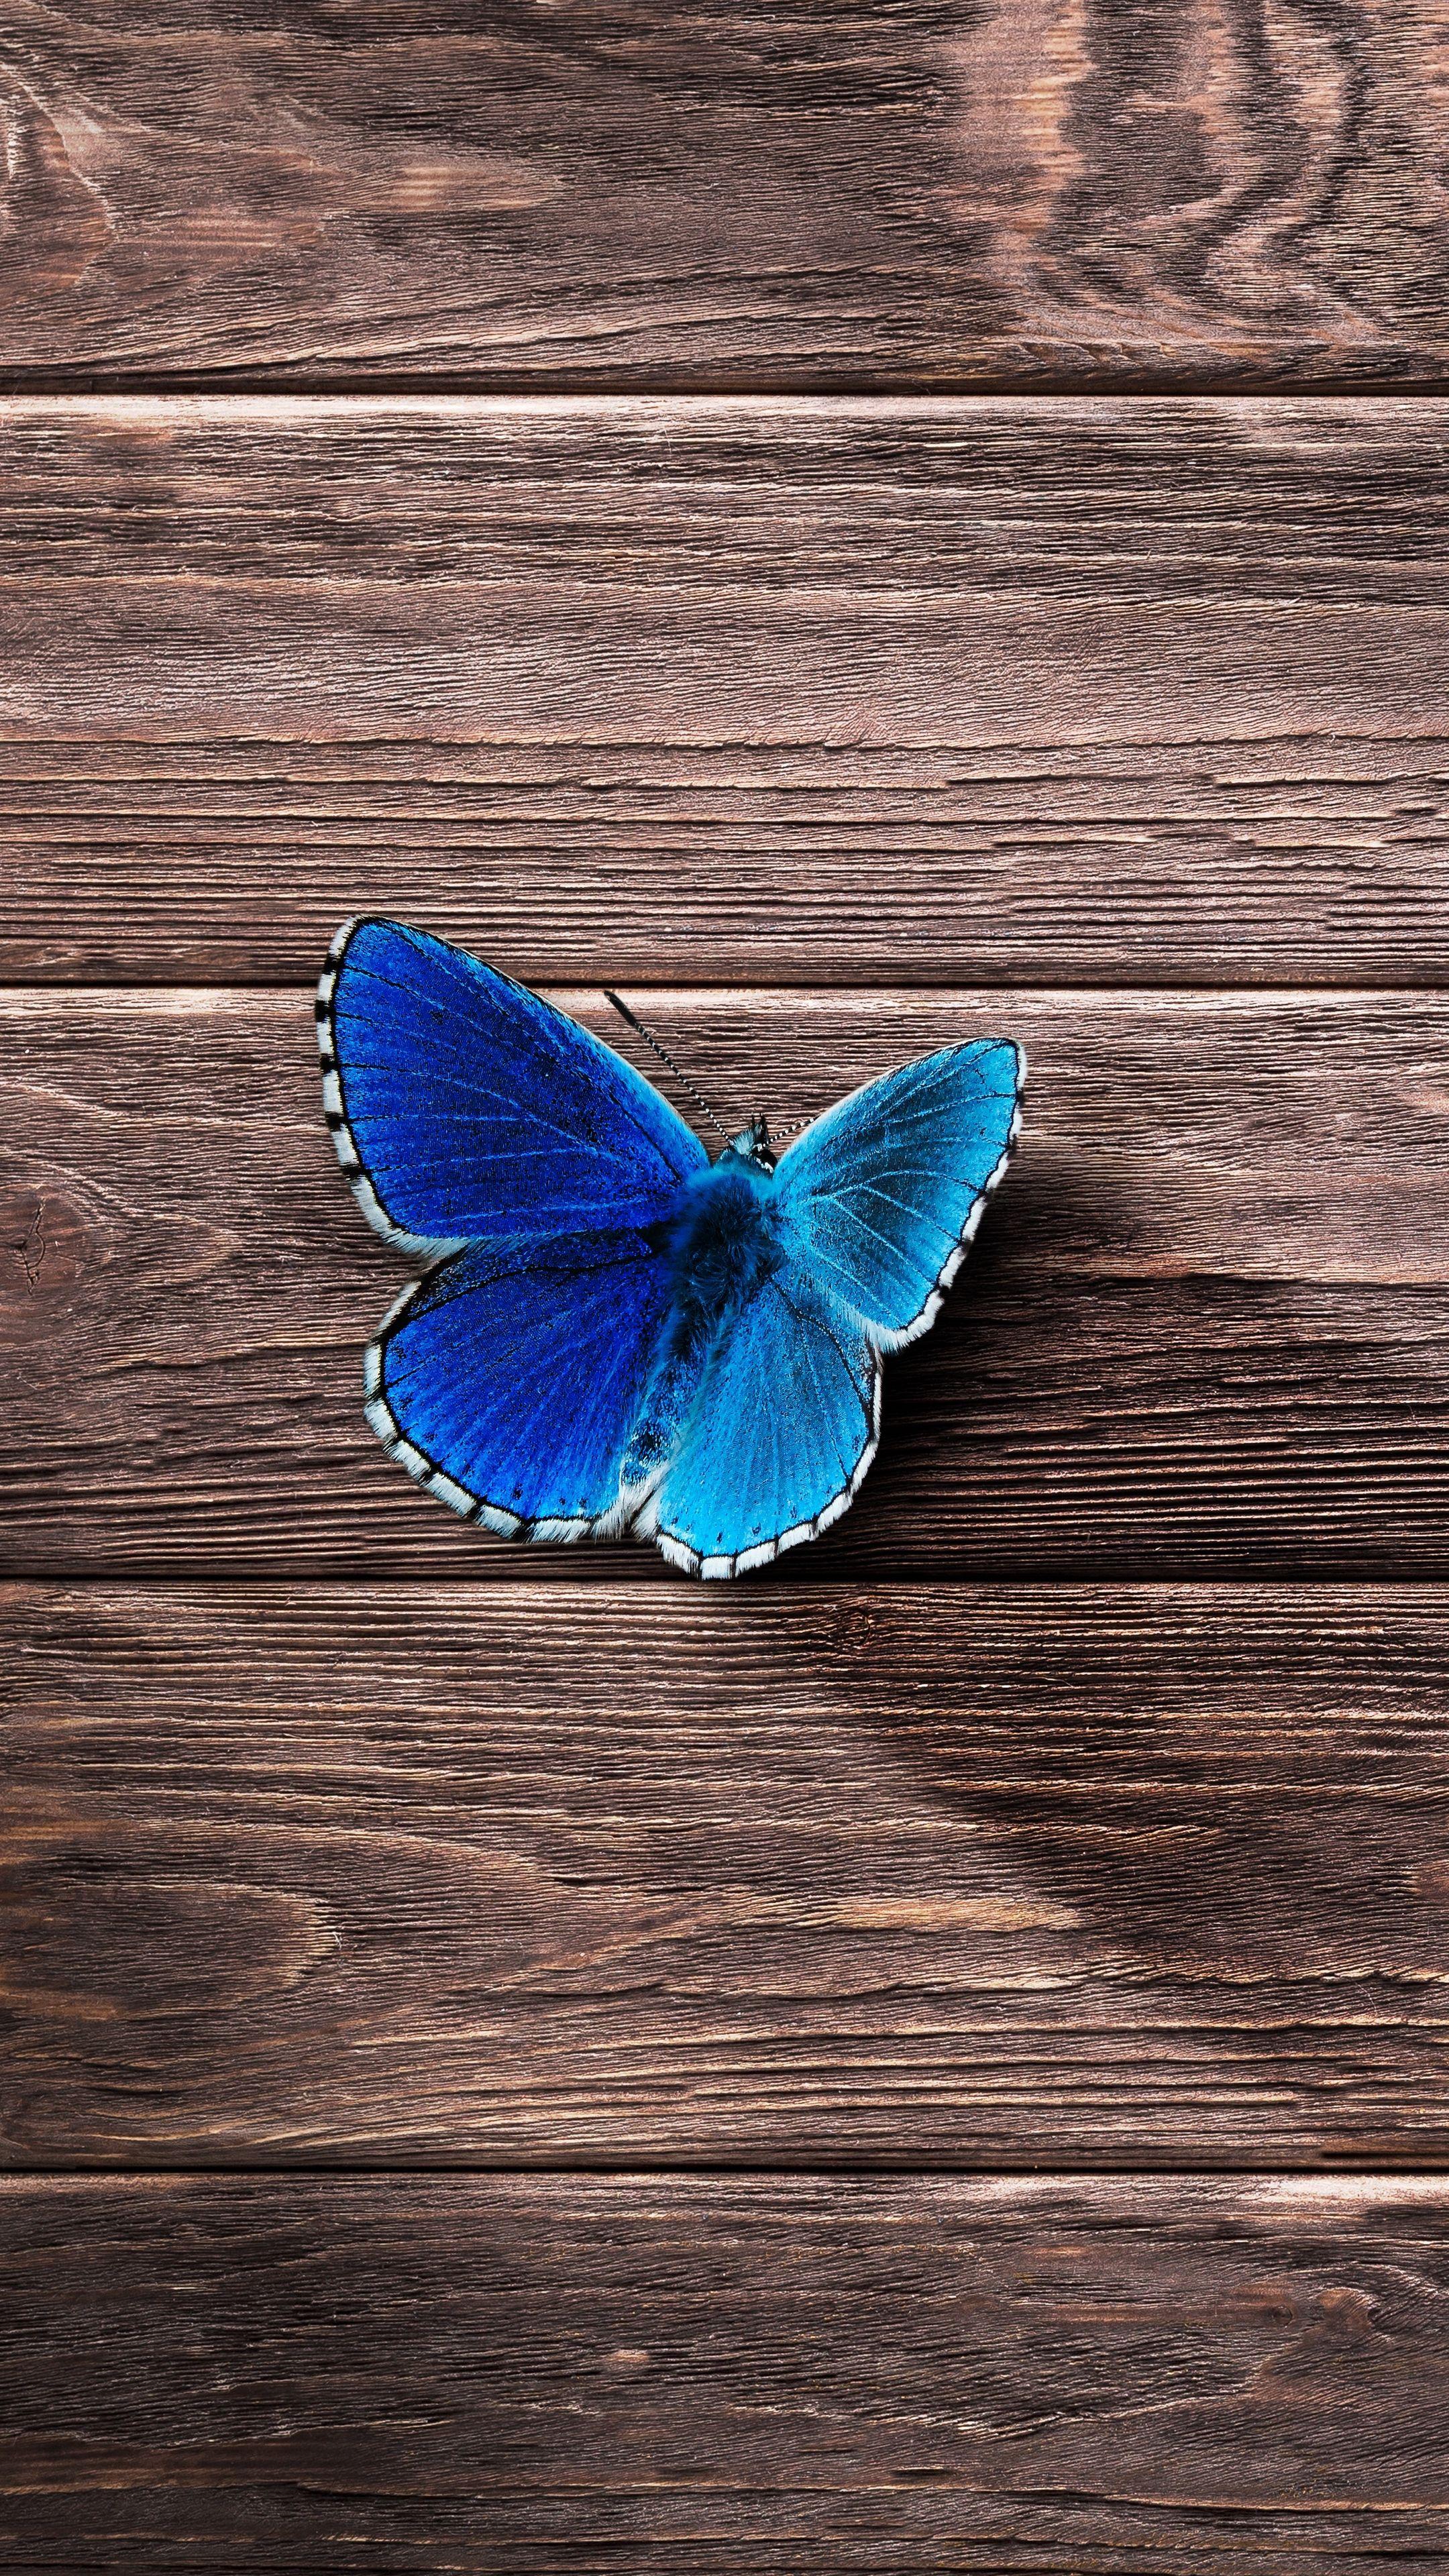 Wallpaper Cave Blue Butterfly Wallpaper Aesthetic